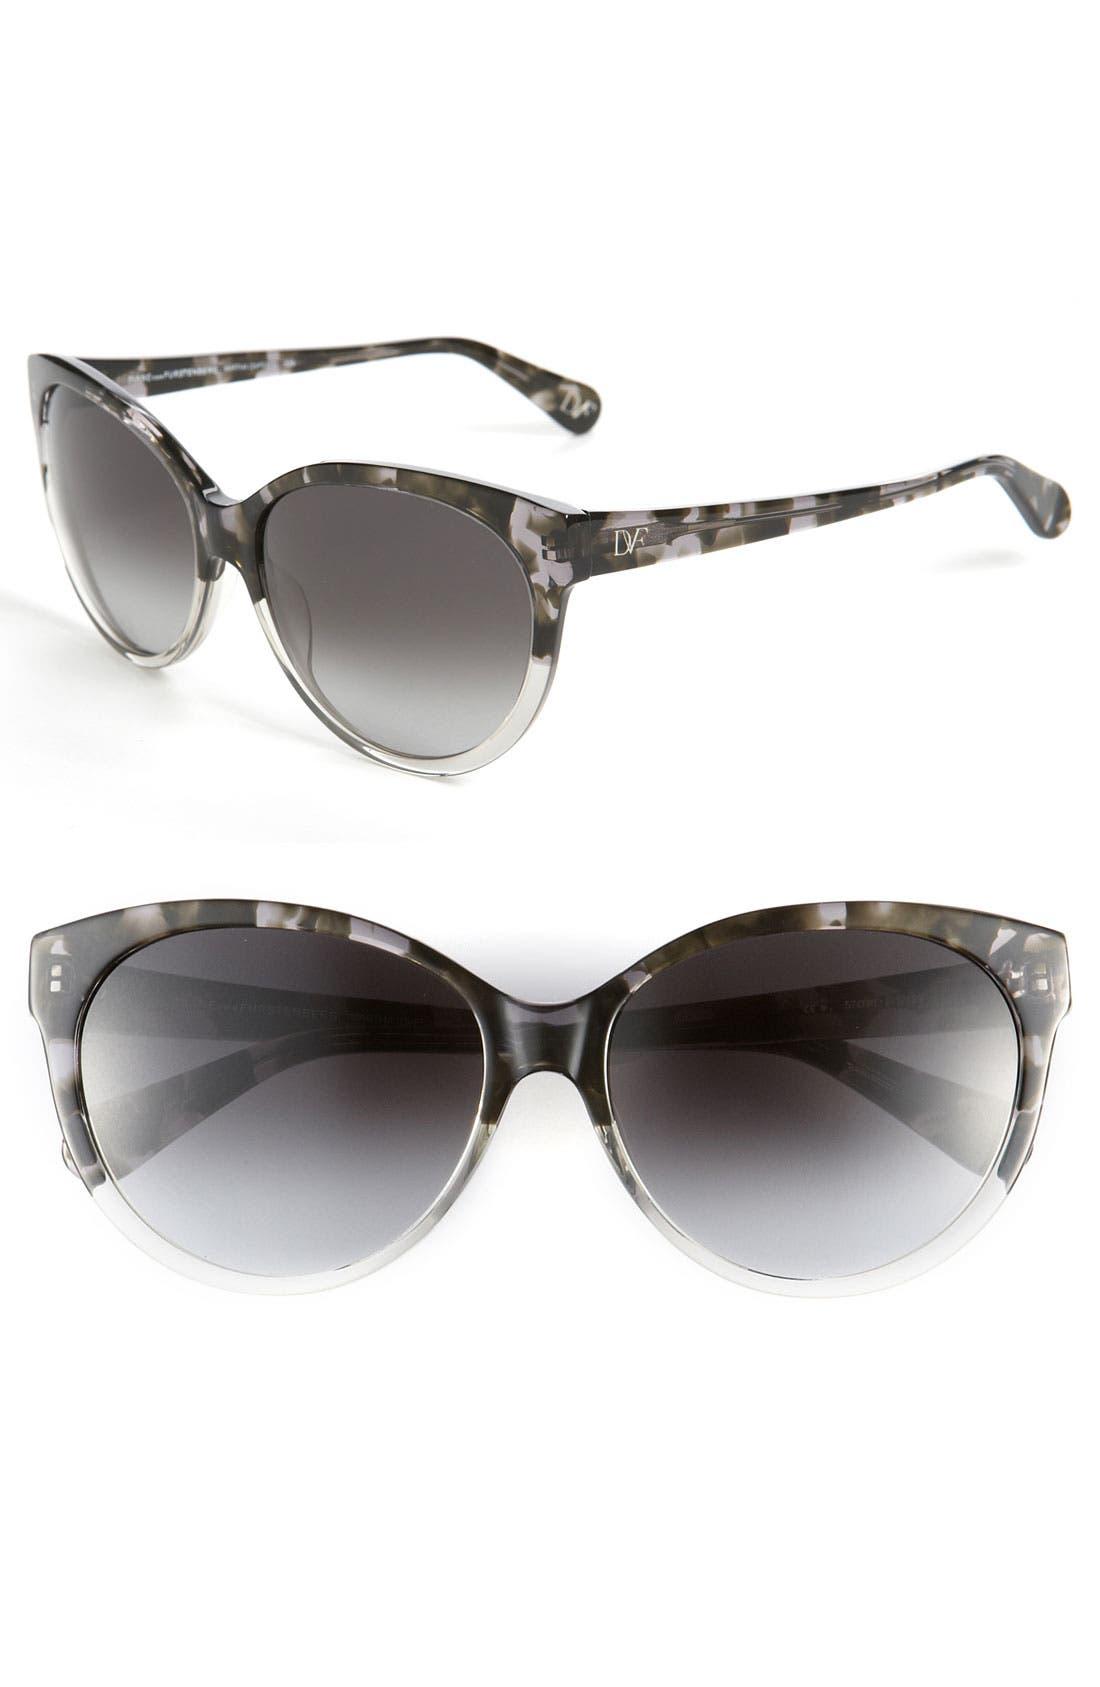 Main Image - Diane von Furstenberg Cat's Eye Sunglasses